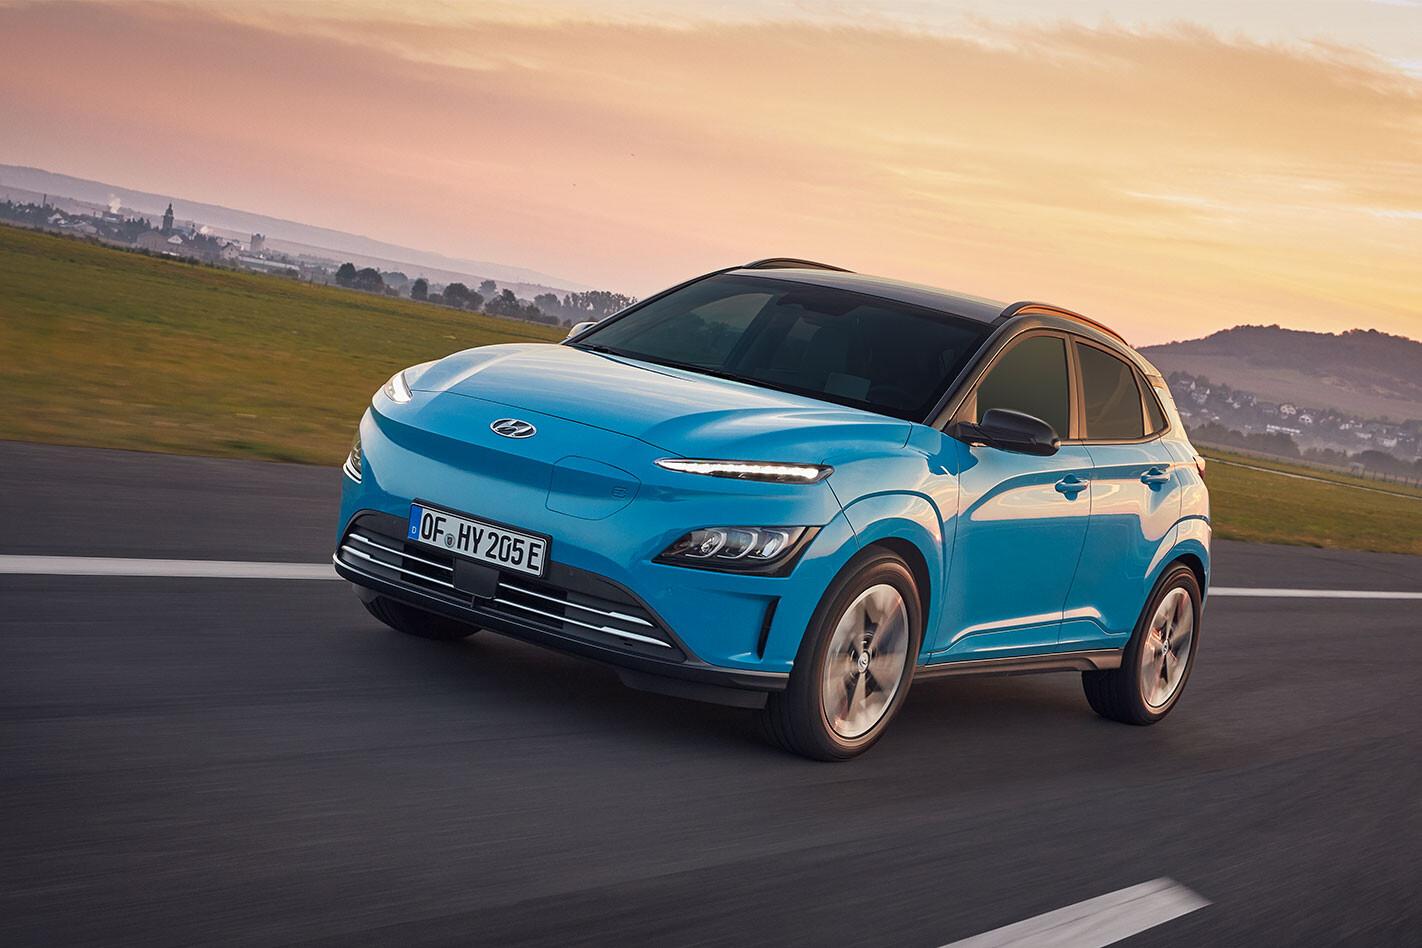 Hyundai Kona Electric Standard Range for Australia